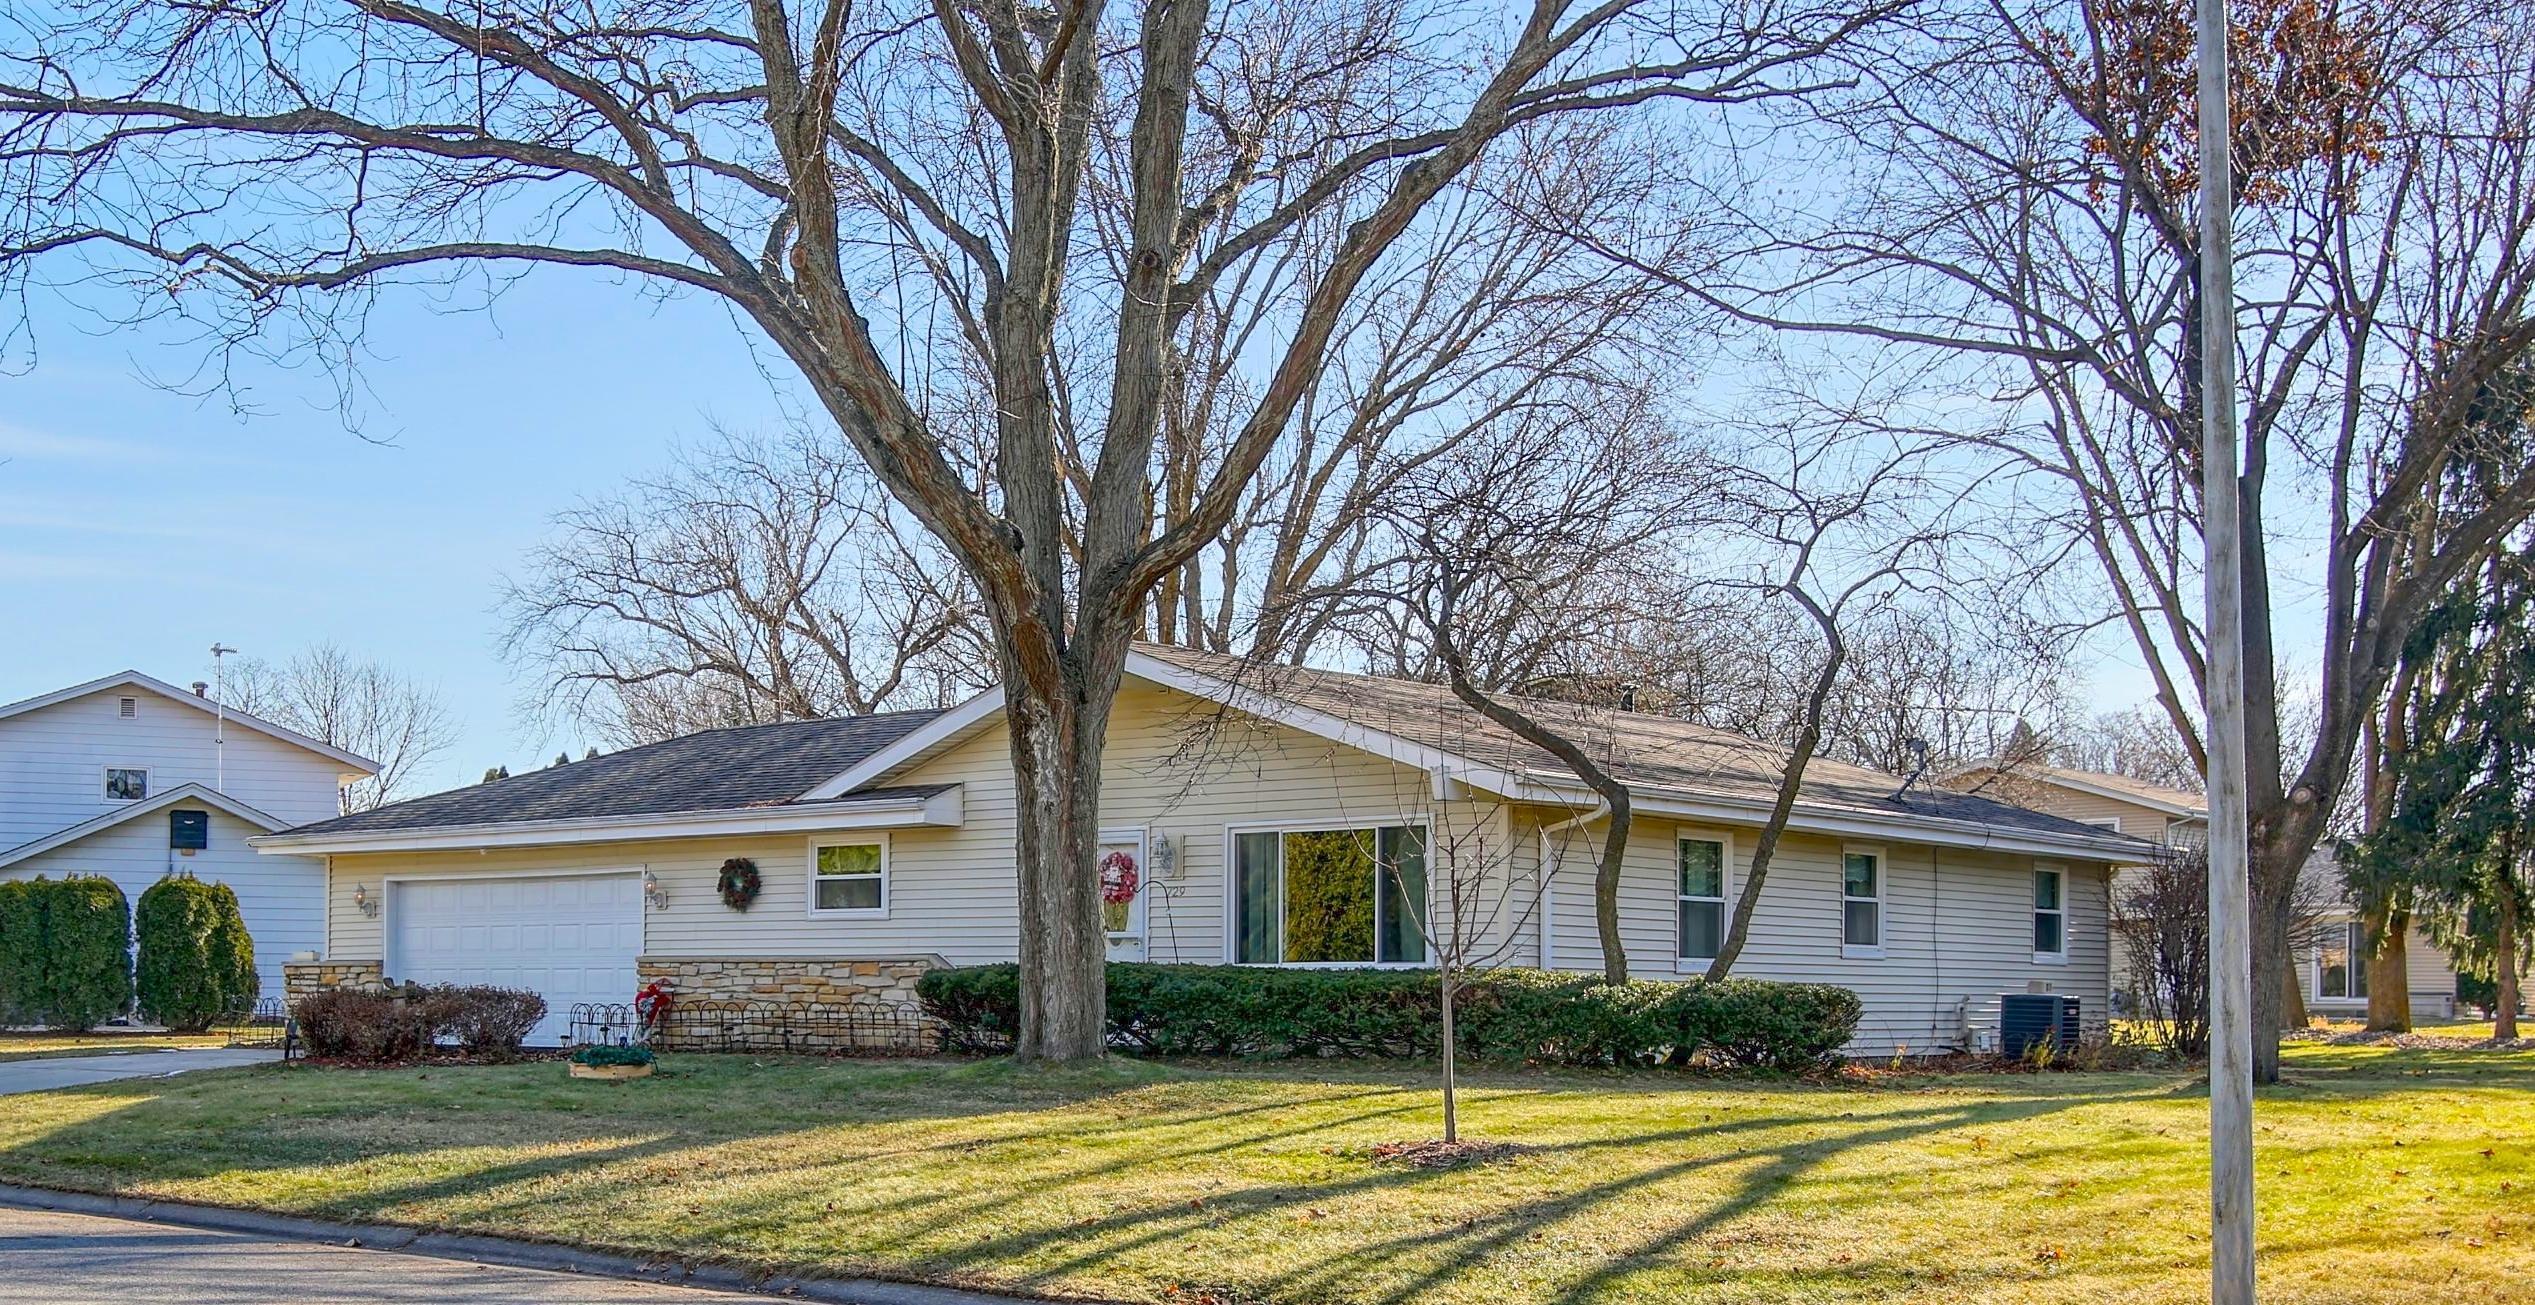 729 Skylark Dr, Oconomowoc, Wisconsin 53066, 3 Bedrooms Bedrooms, ,1 BathroomBathrooms,Single-Family,For Sale,Skylark Dr,1622202